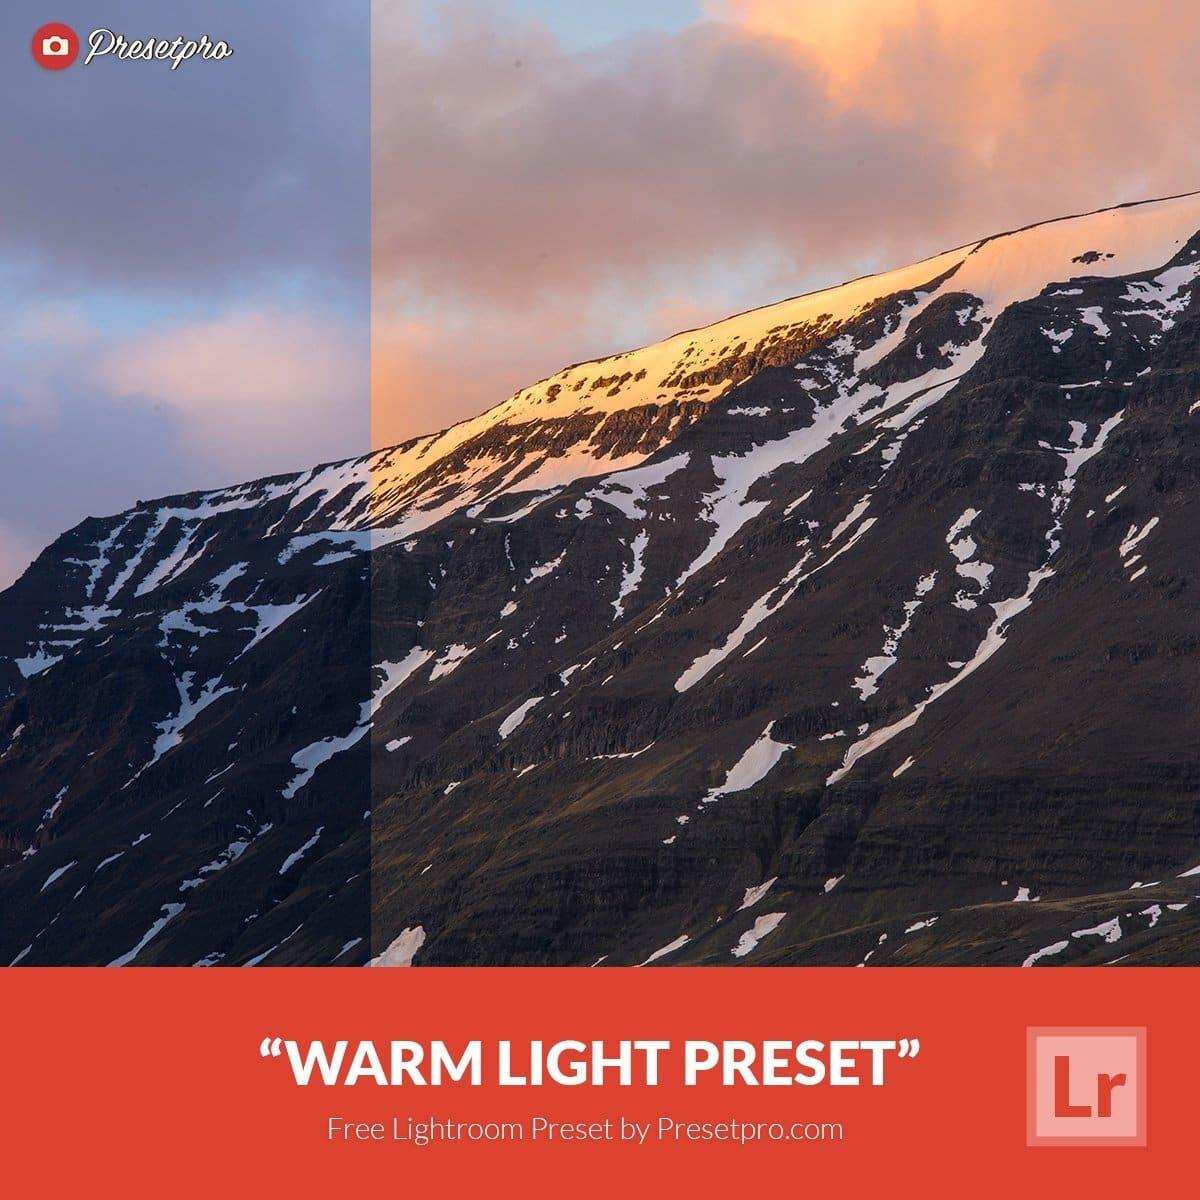 Free-Lightroom-Preset-Warm-Light-Presetpro.com